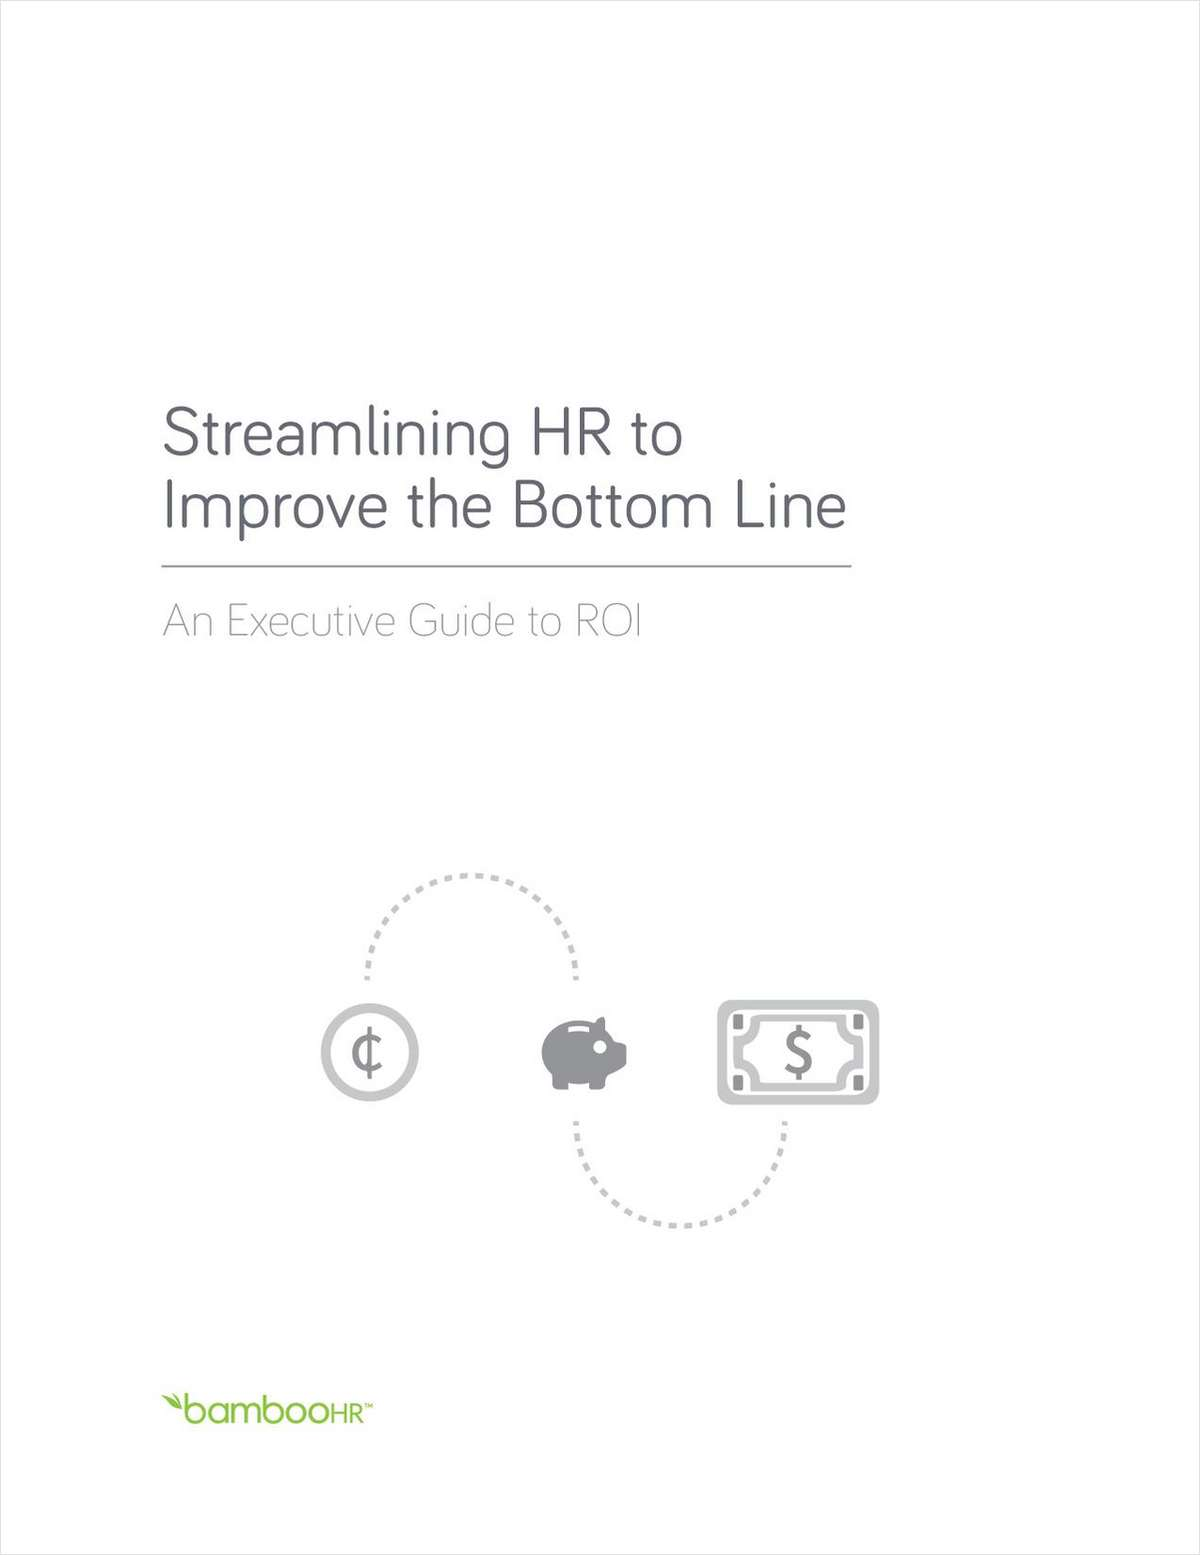 Streamlining HR to Improve the Bottom Line